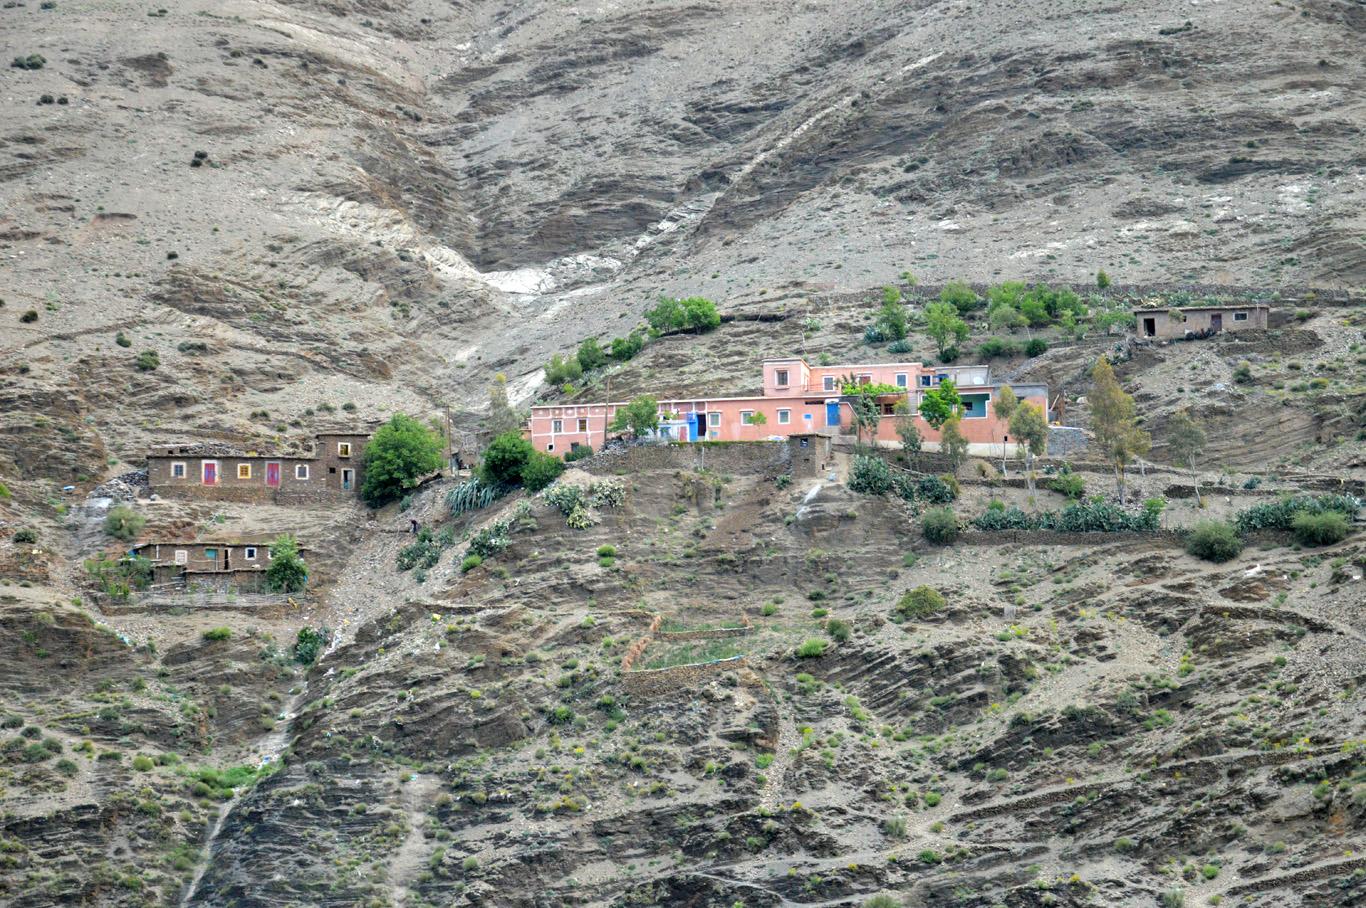 A village in Atlas Mountains